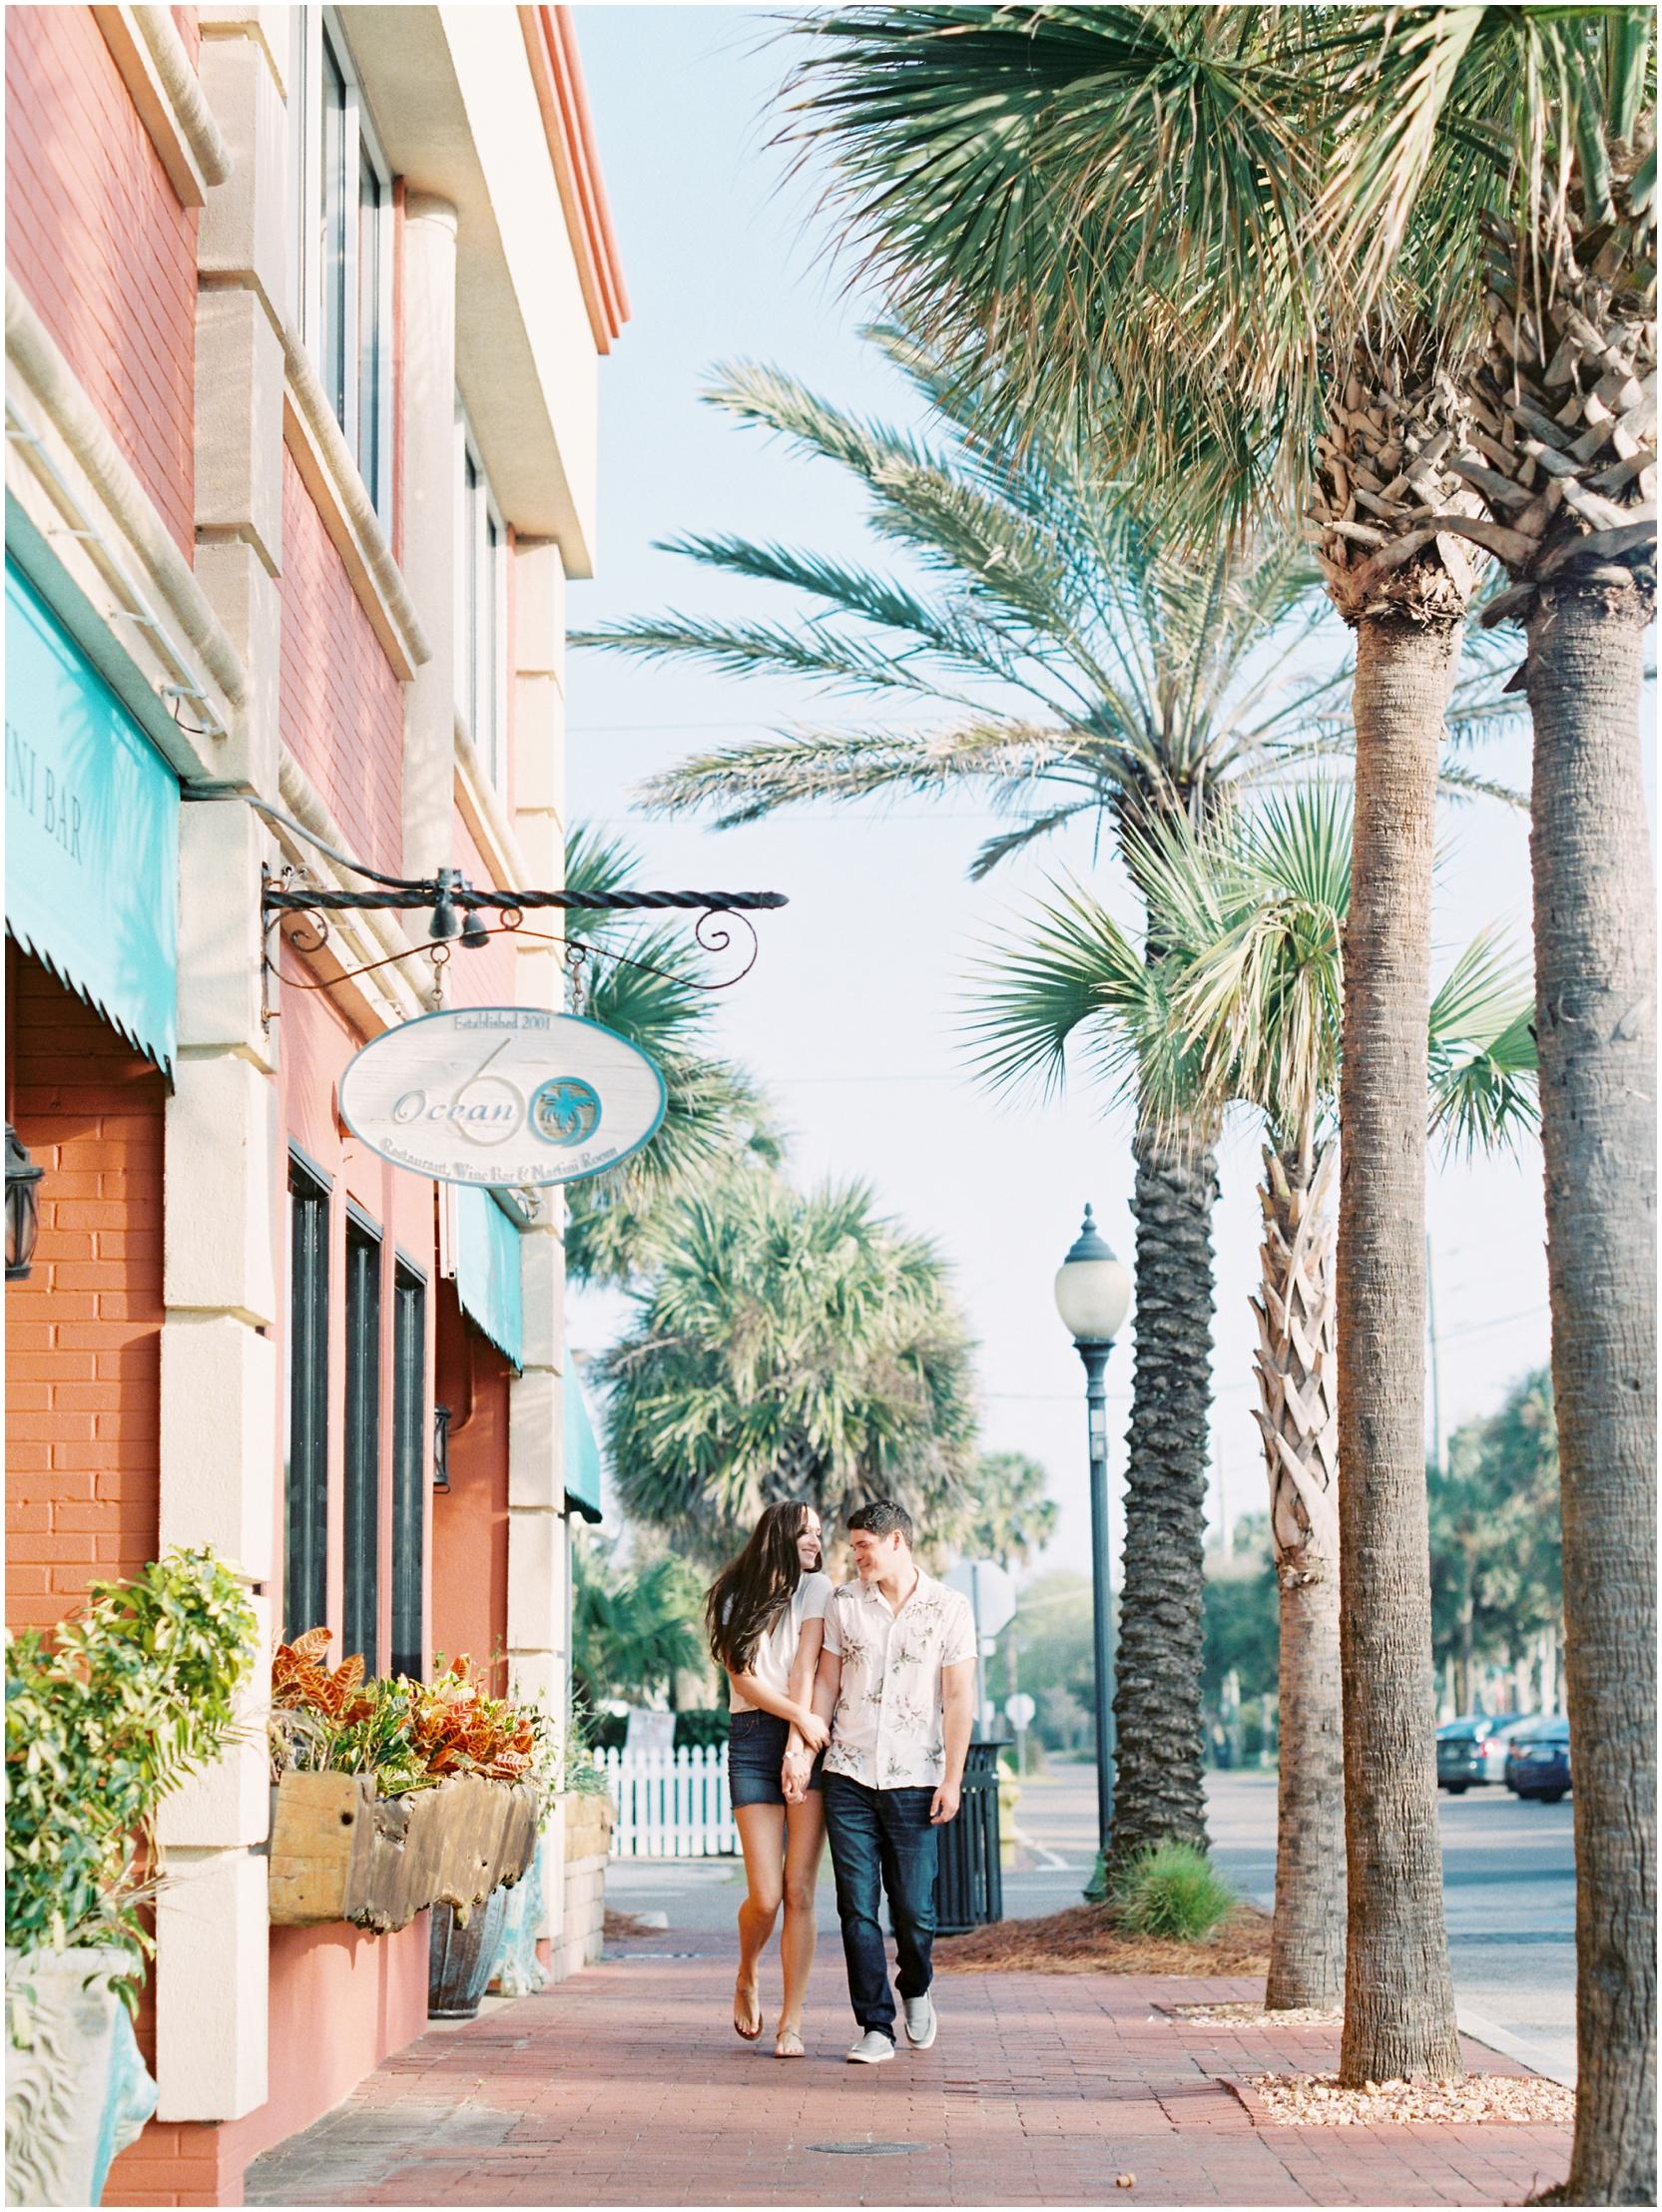 Lisa Silva Photography -Engagement Session at Neptune Beach, Florida- Jacksonville and North East Florida Fine Art Film Photographer_0033.jpg